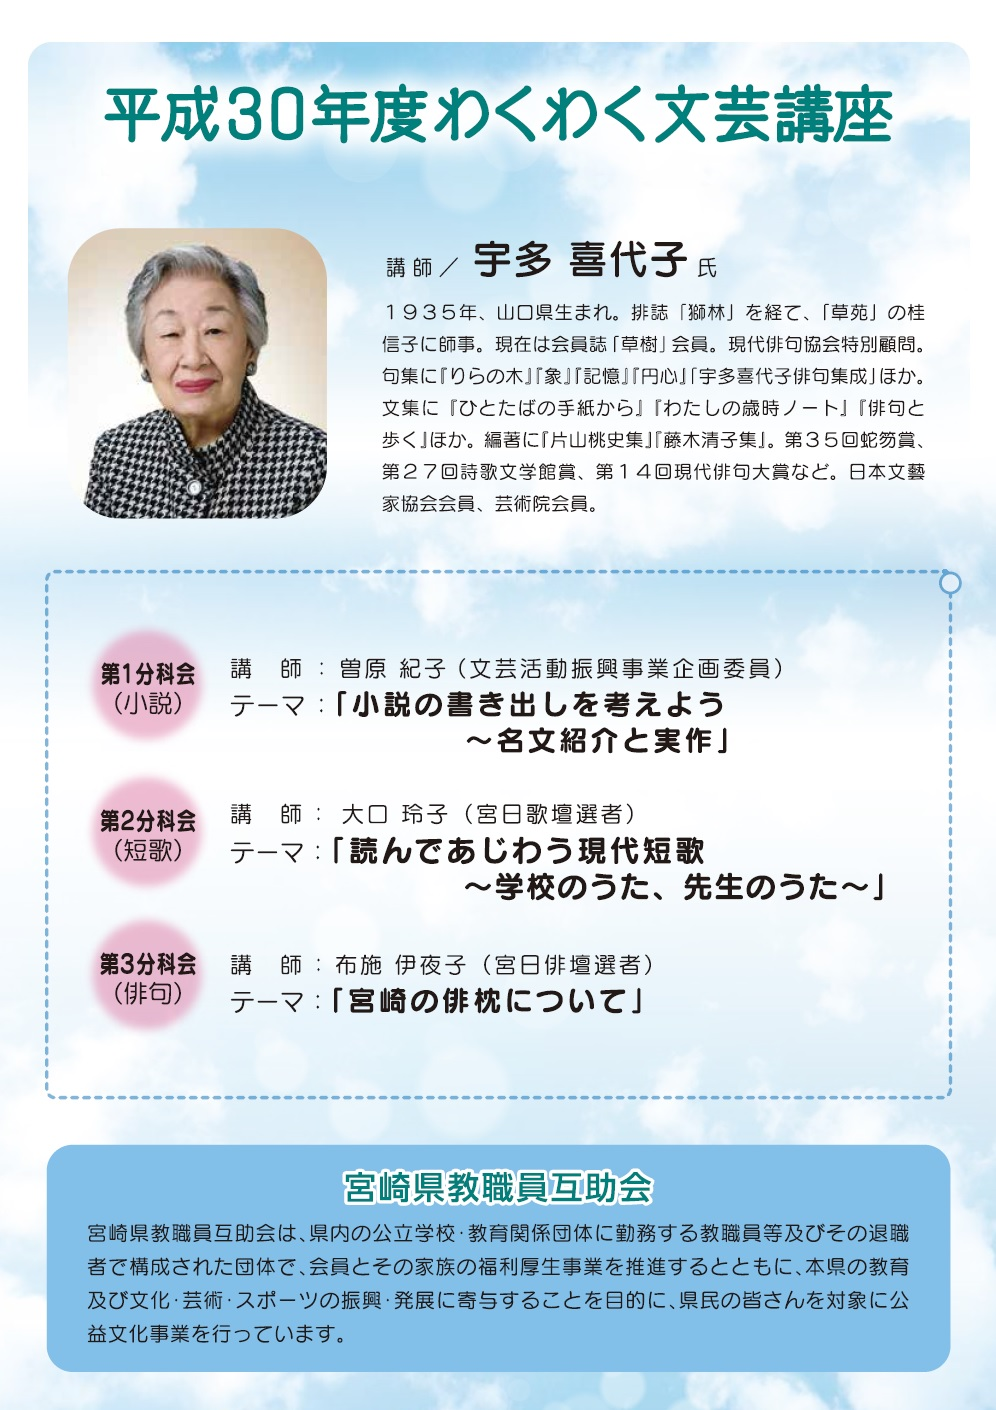 http://www.miyazaki-kyogo.or.jp/publiculture/literacy/wakuwaku/img/H30wakuwaku-ura.jpg